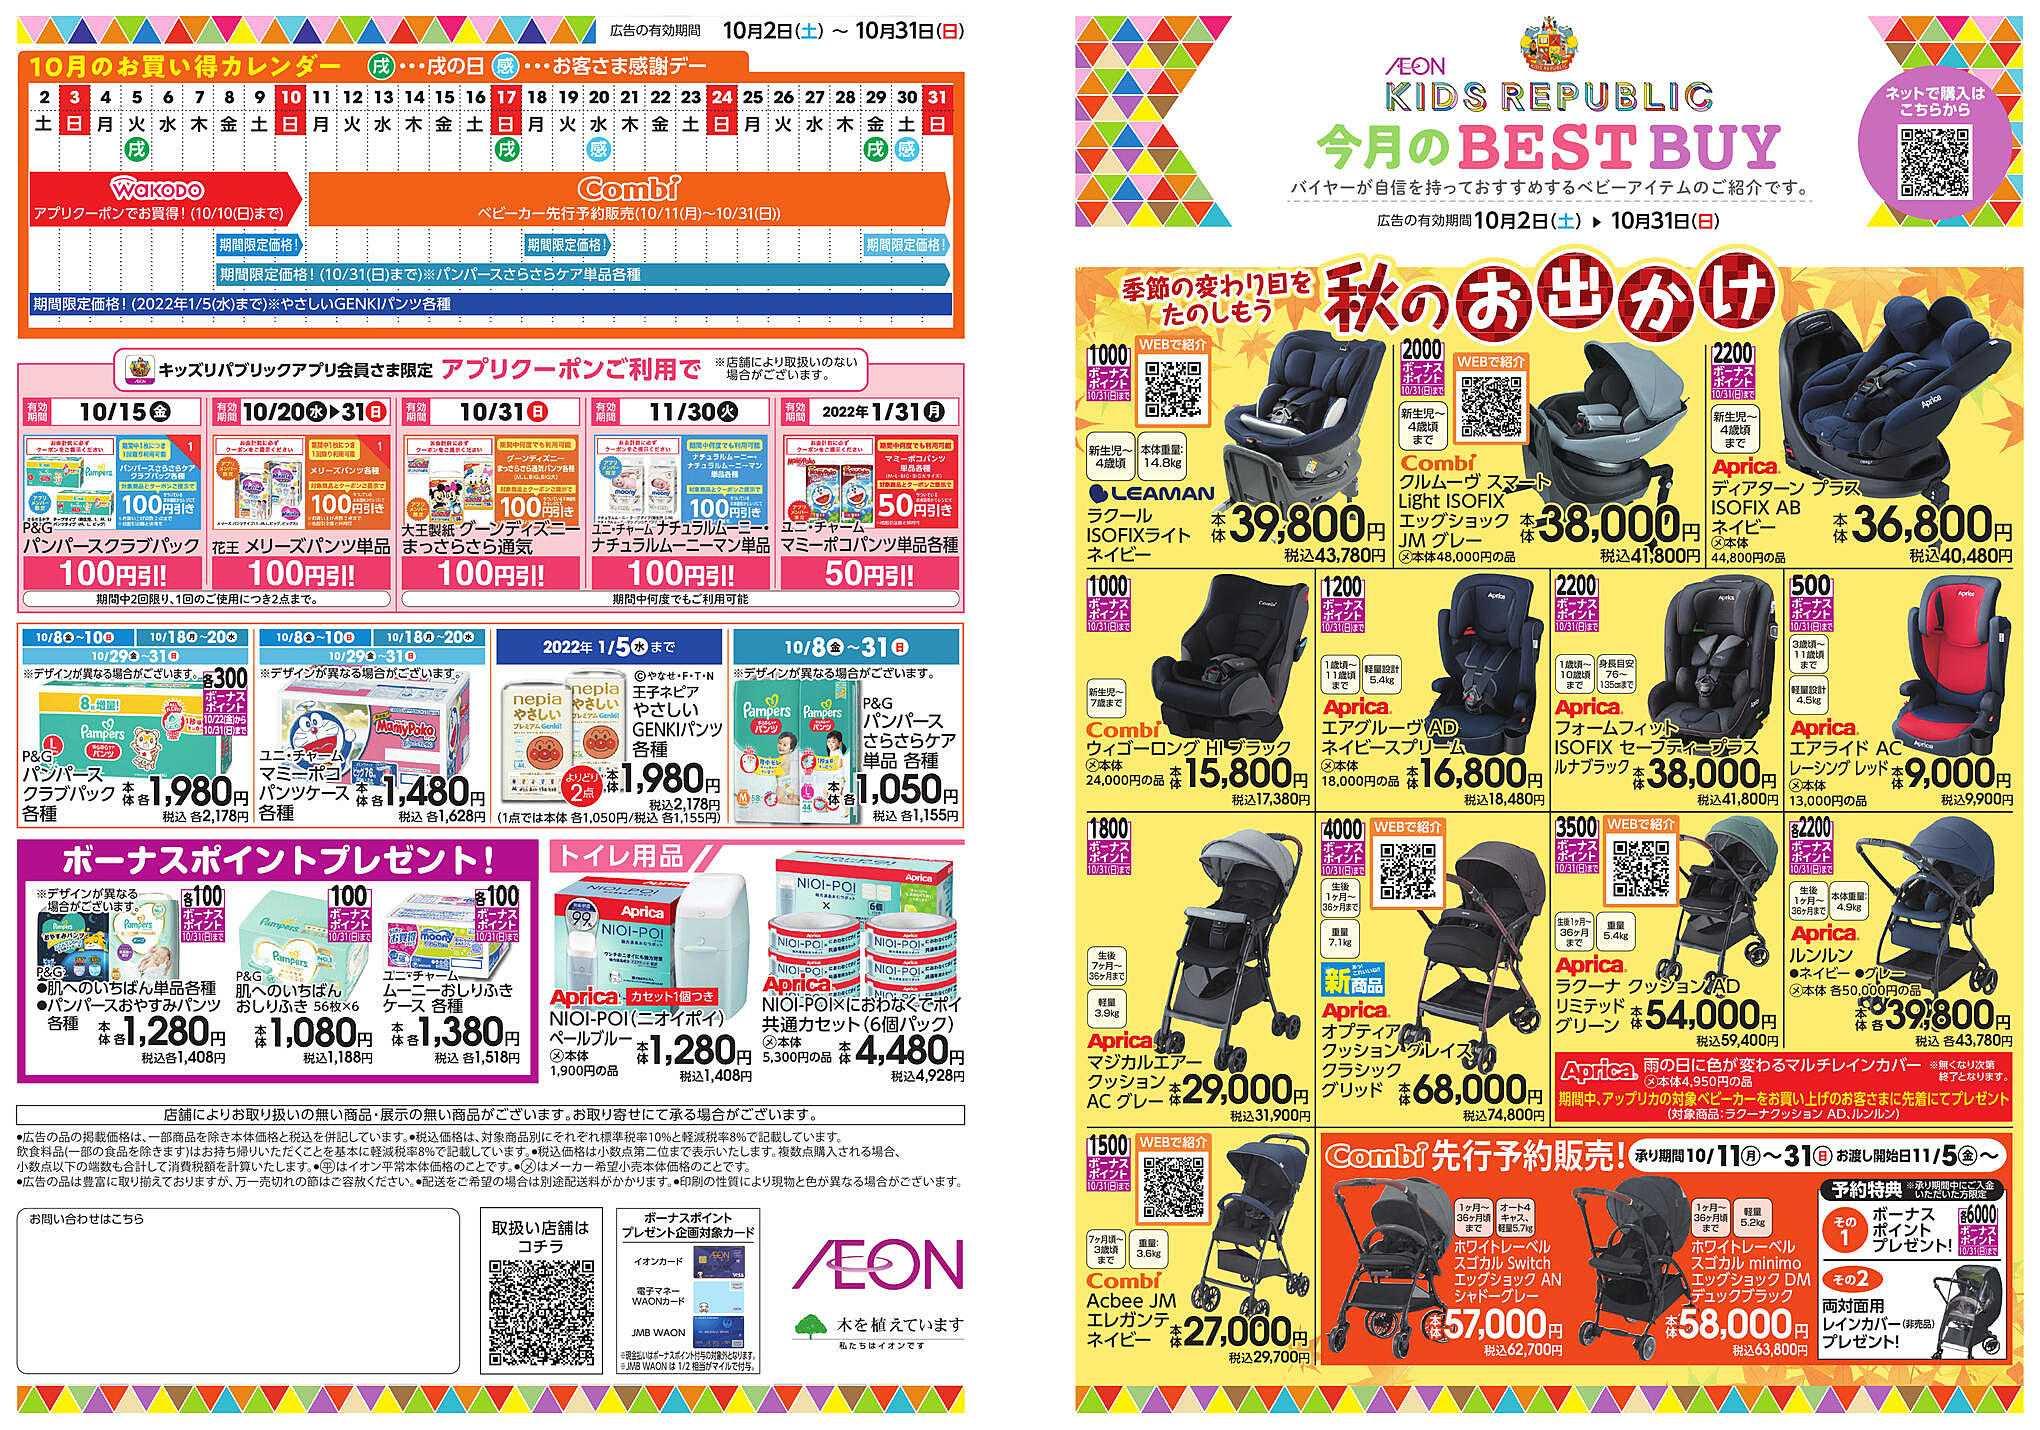 Compressed nr cc2b7161a6694adc8cd56a58b42479ce